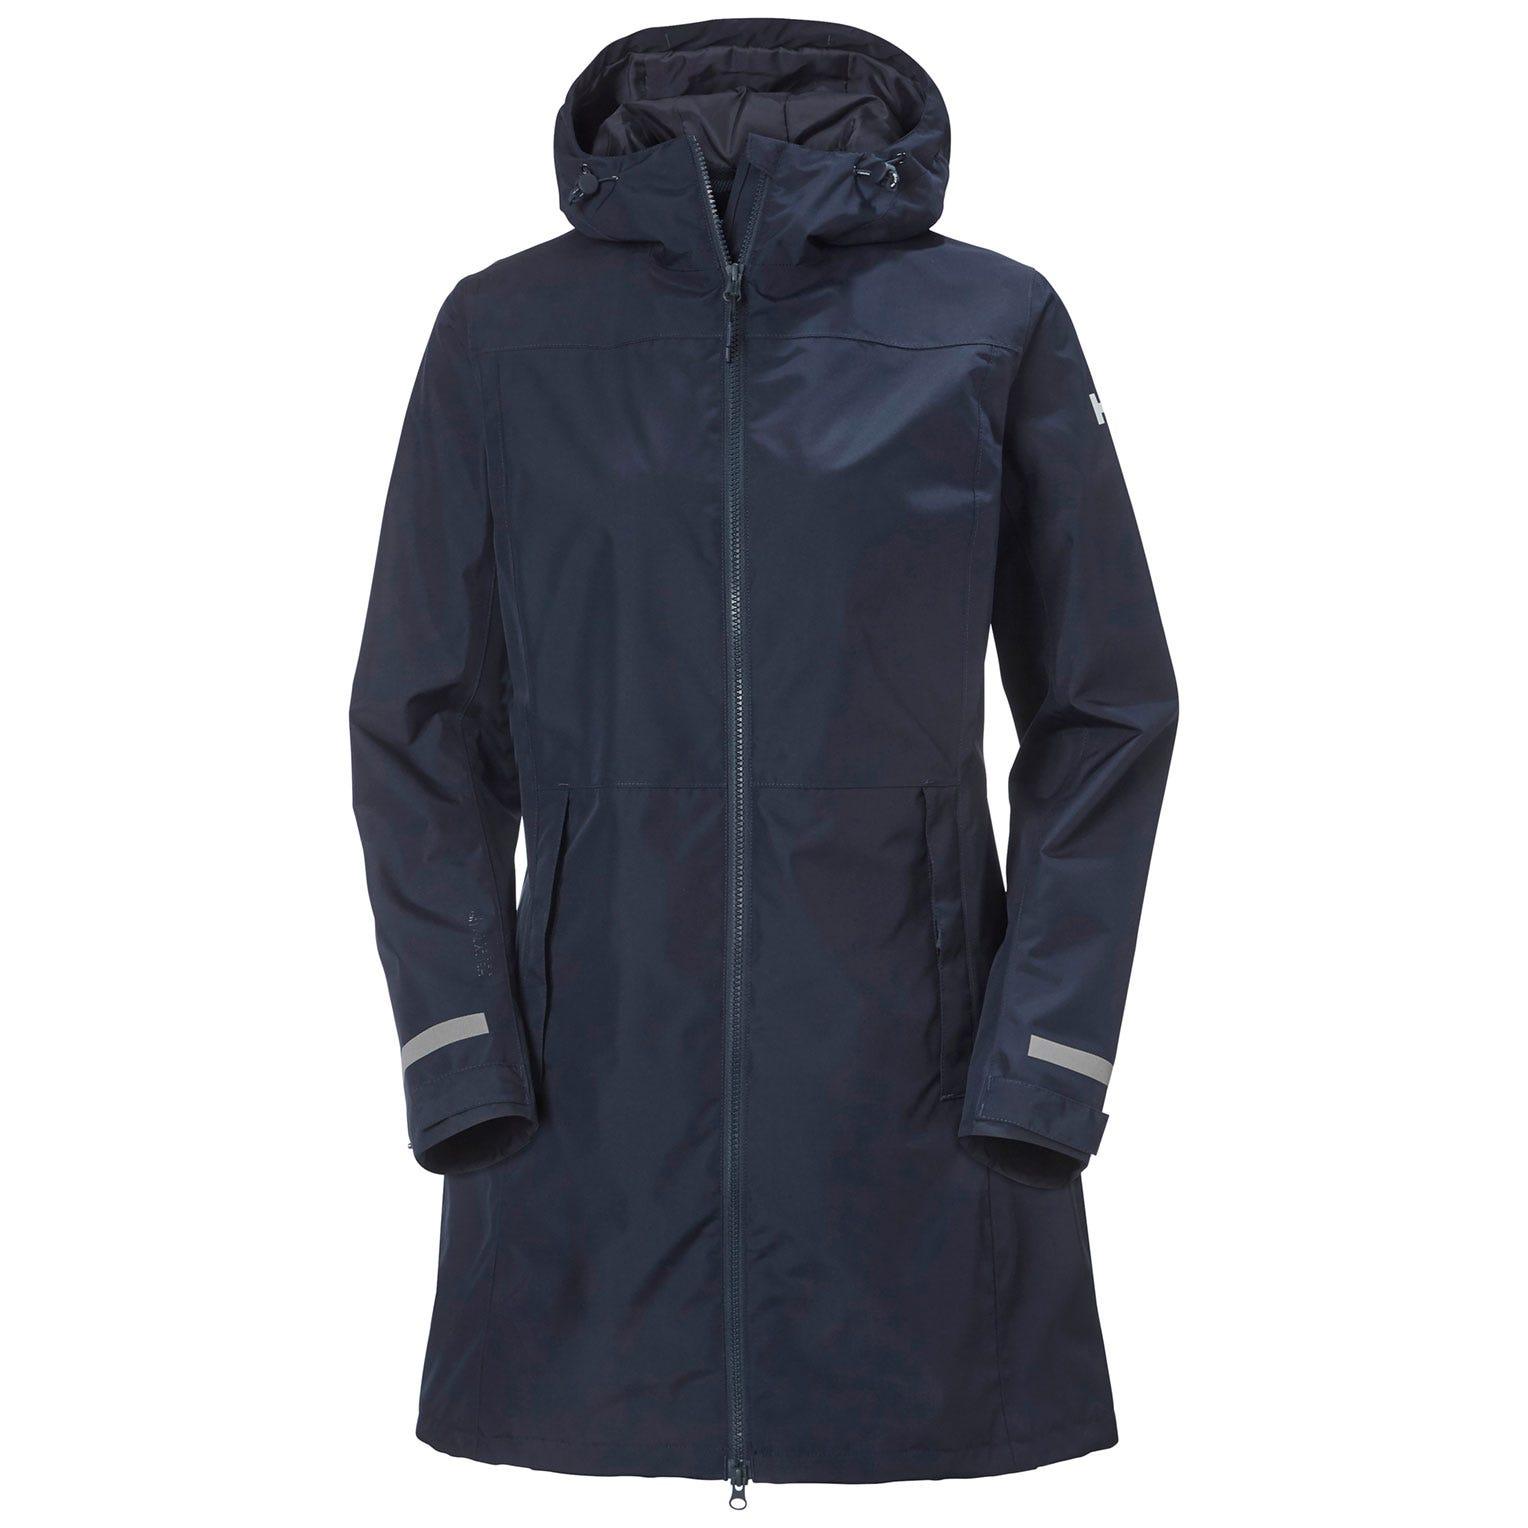 Helly Hansen Womens Lisburn Waterproof Urban Raincoat XS